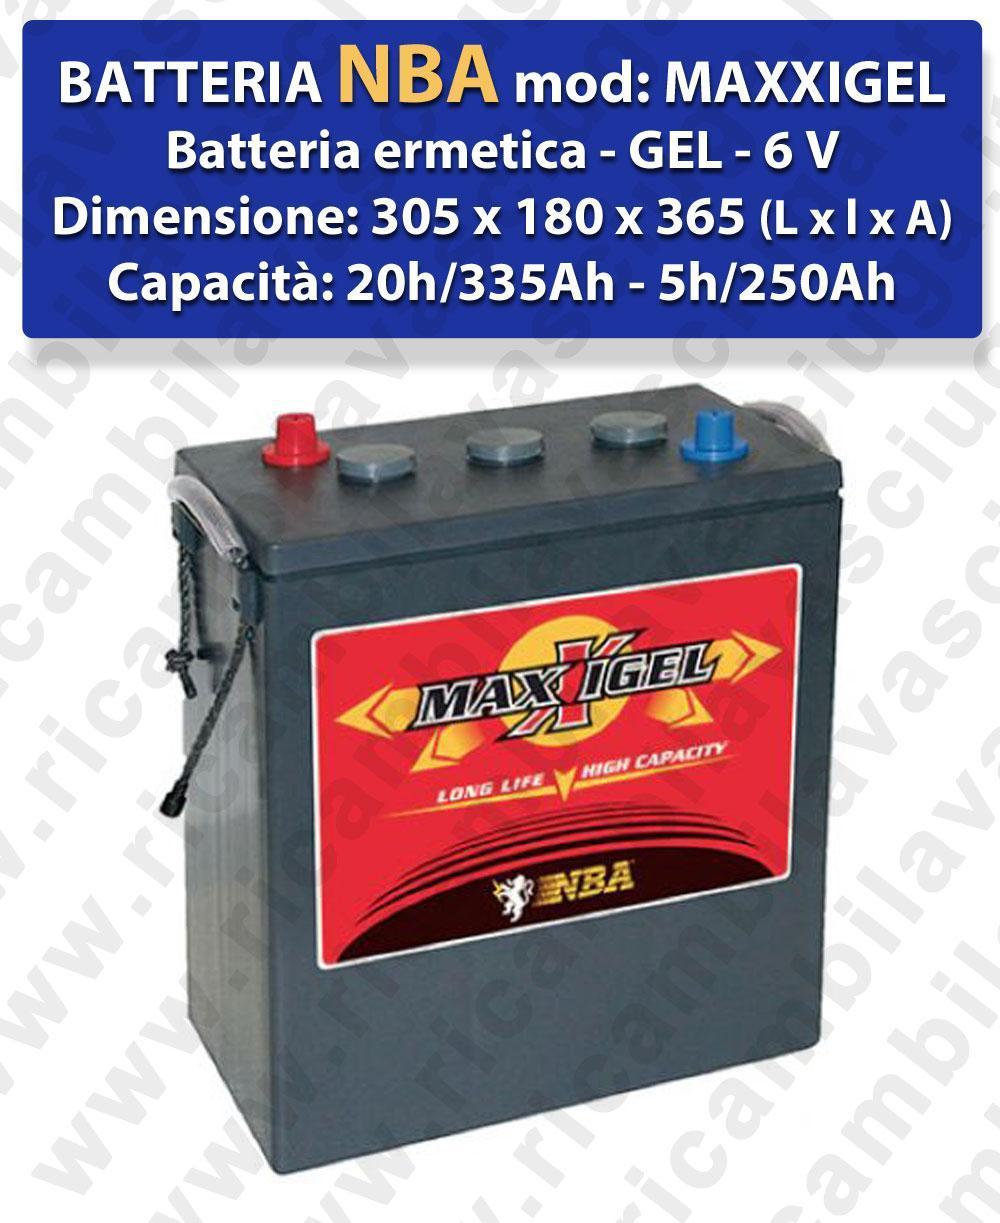 MAXXIGEL Hermetische Batterie - Gel 6V 335Ah 20/h NBA